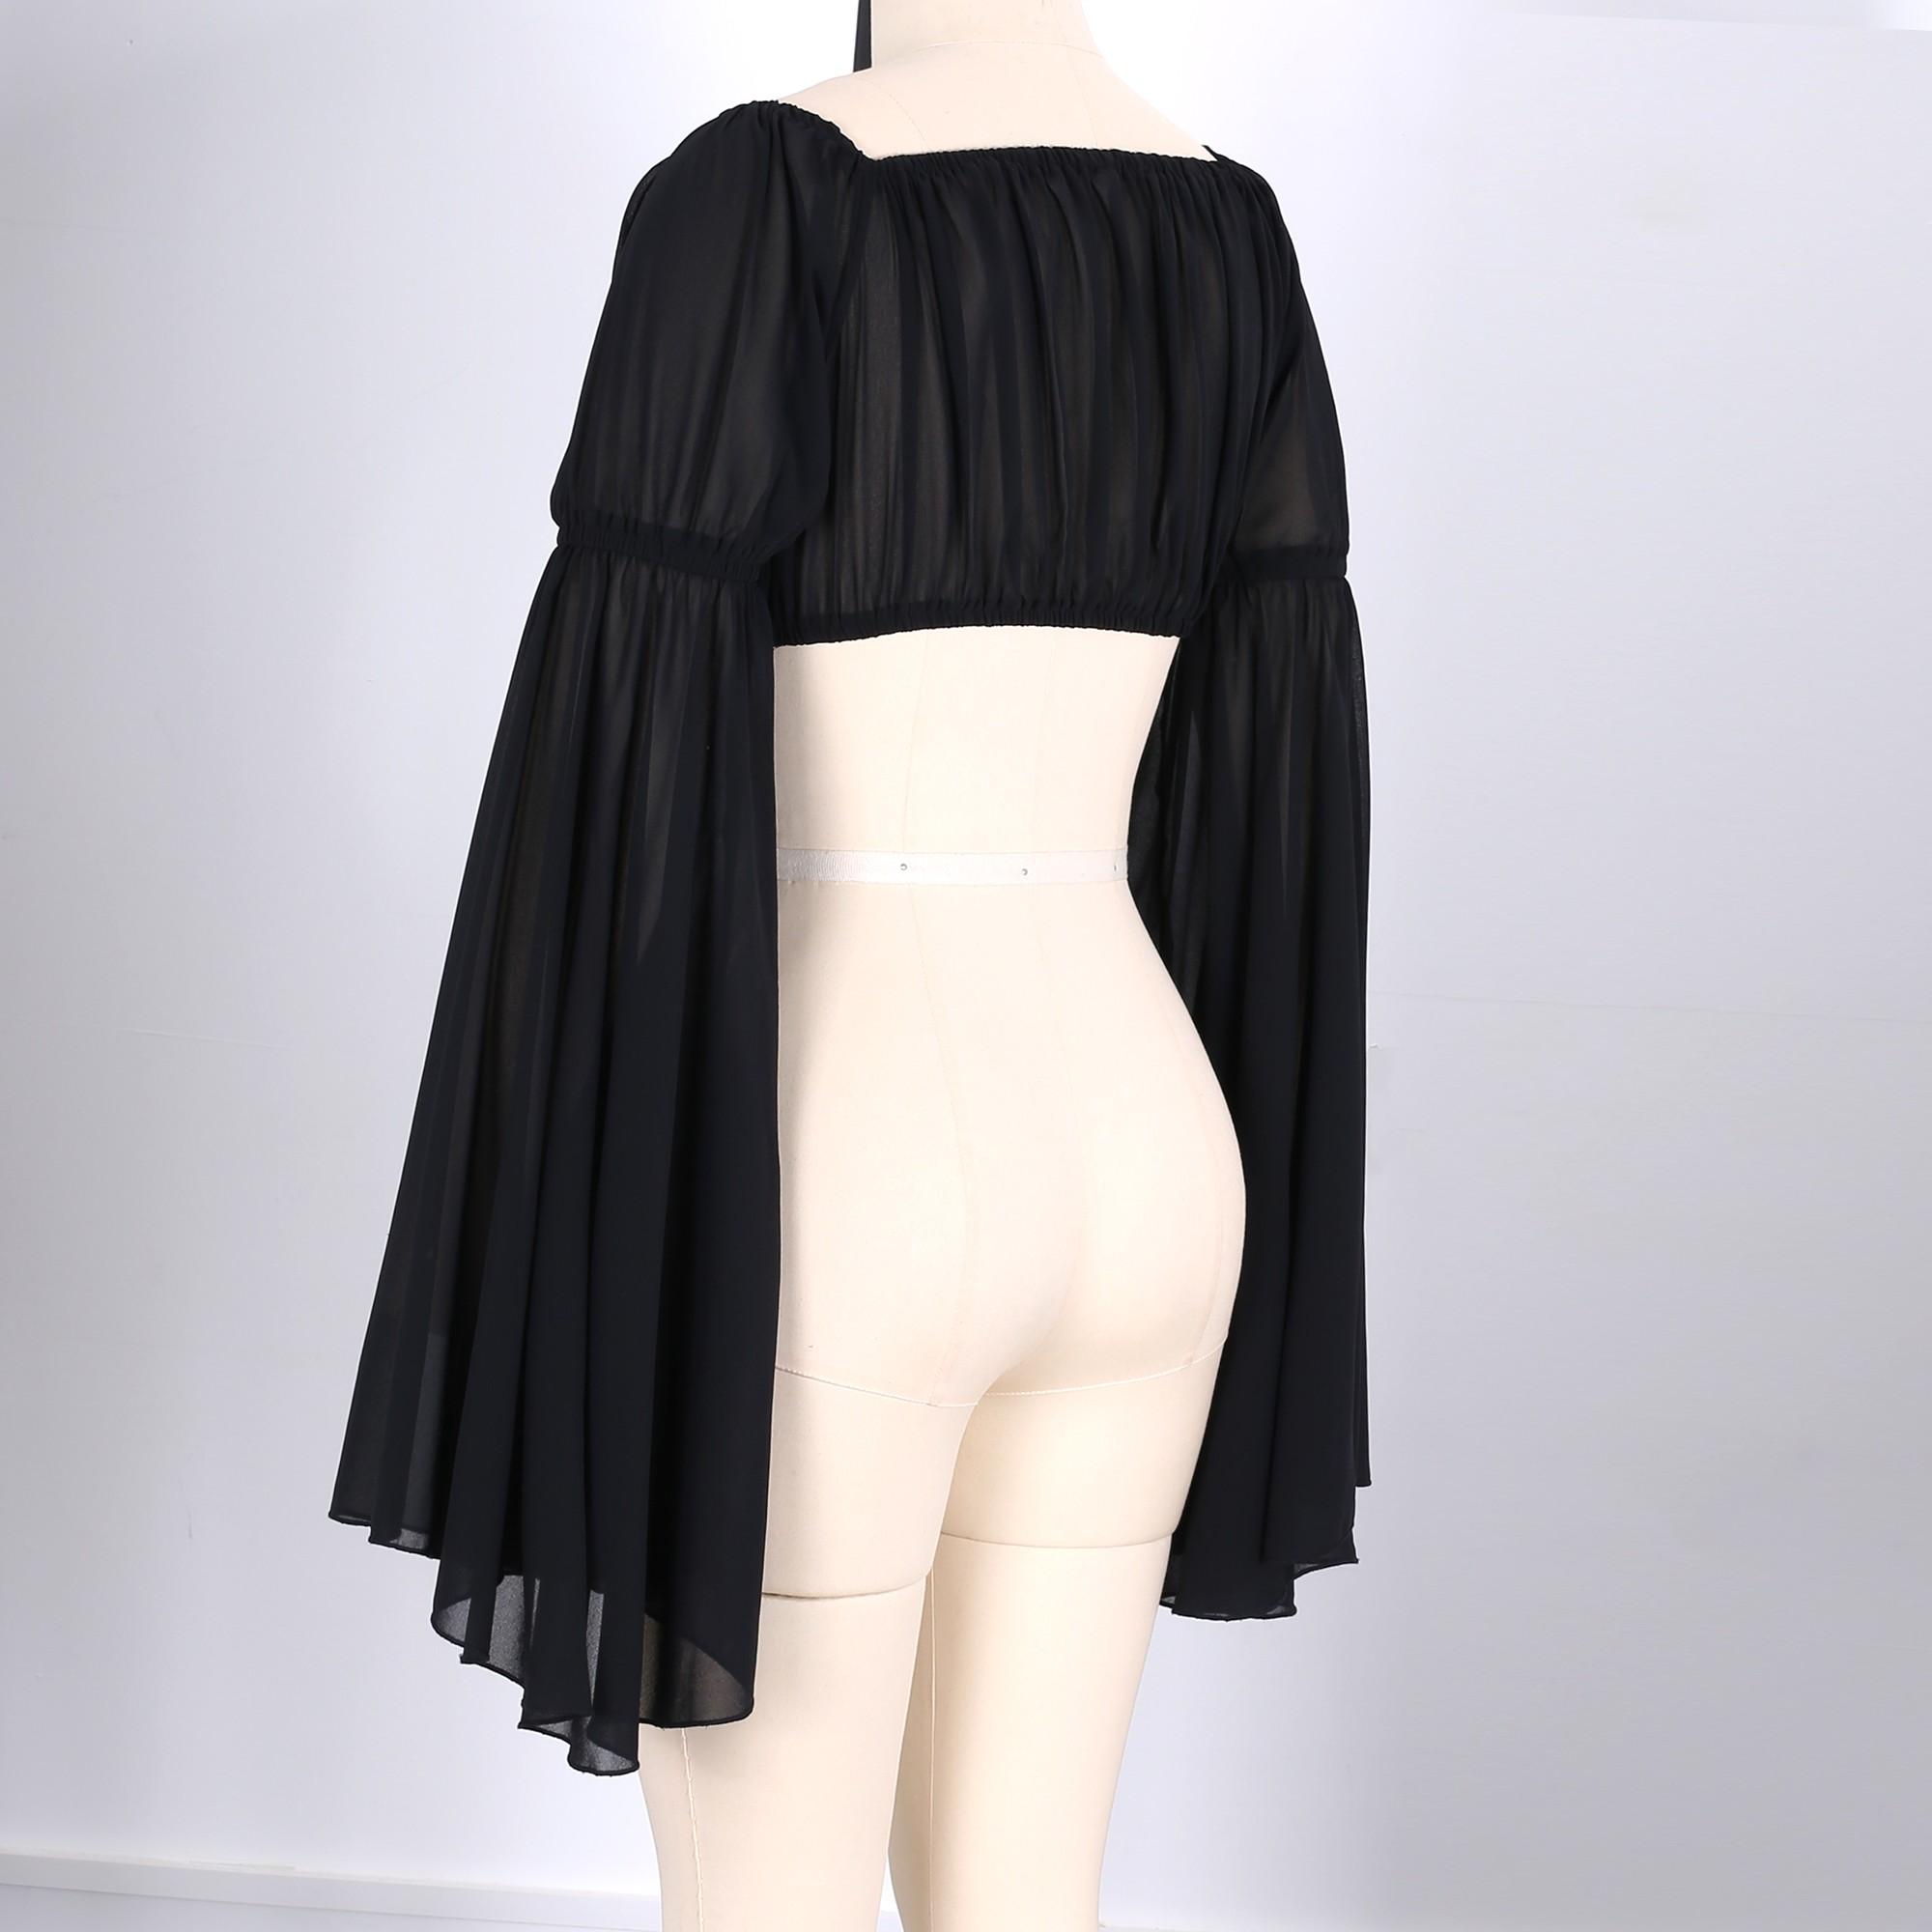 Black Off Shoulder Long Sleeve Mini Ruched Pagoda Sleeve Summer Bodycon Top HD512-Black